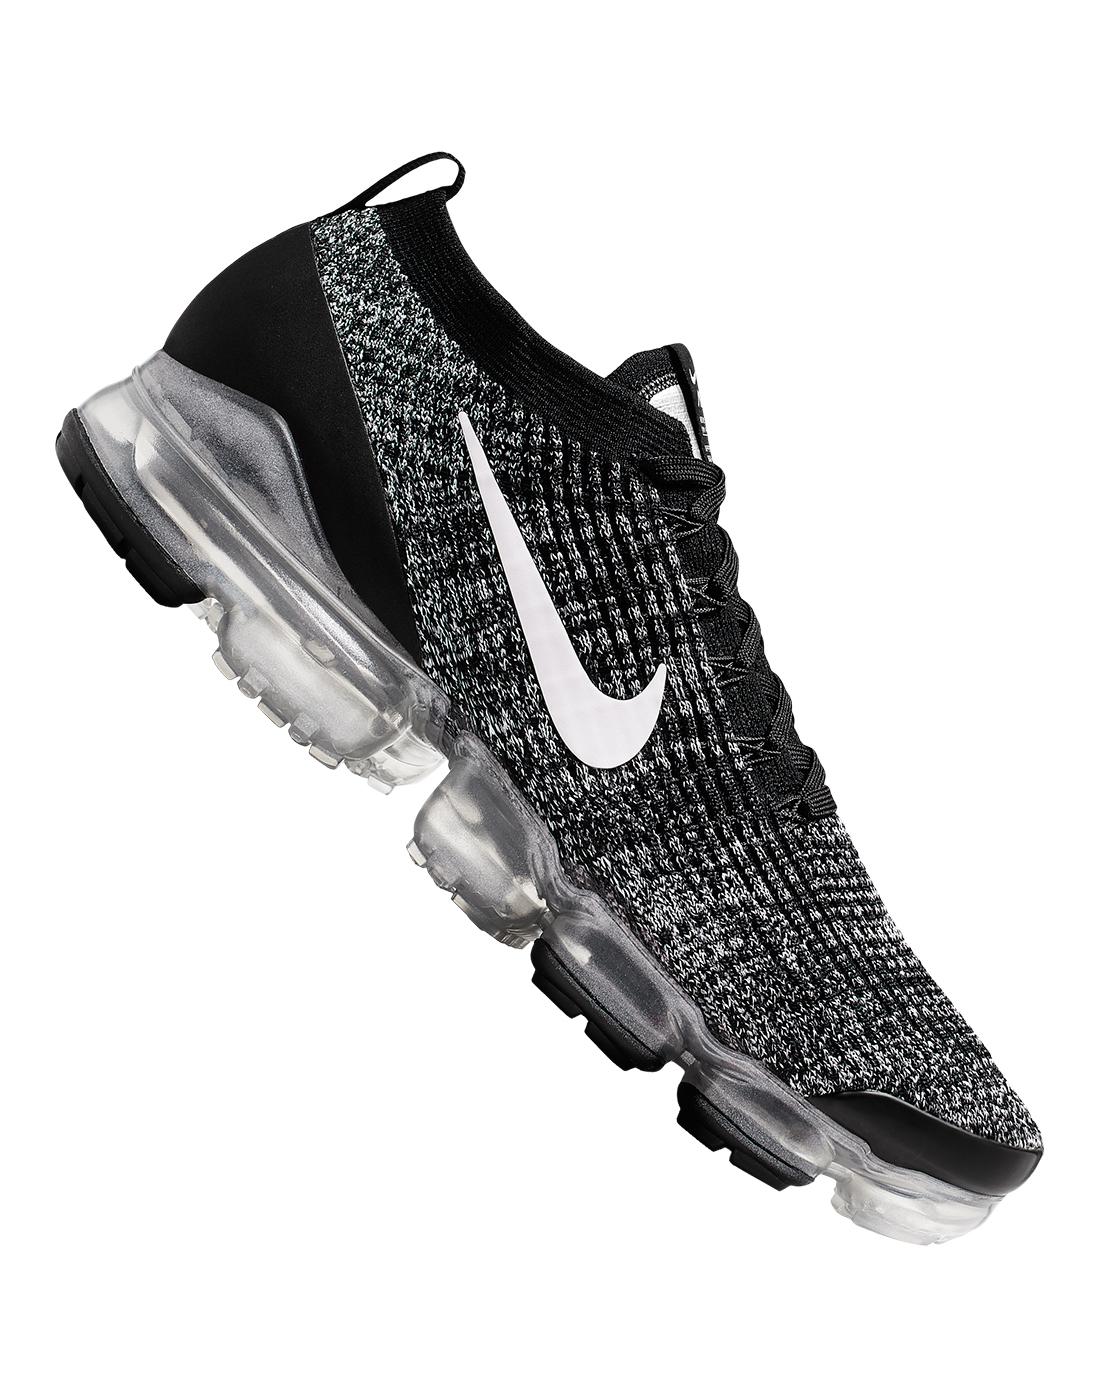 Men S Black White Nike Vapormax Flyknit 3 Life Style Sports